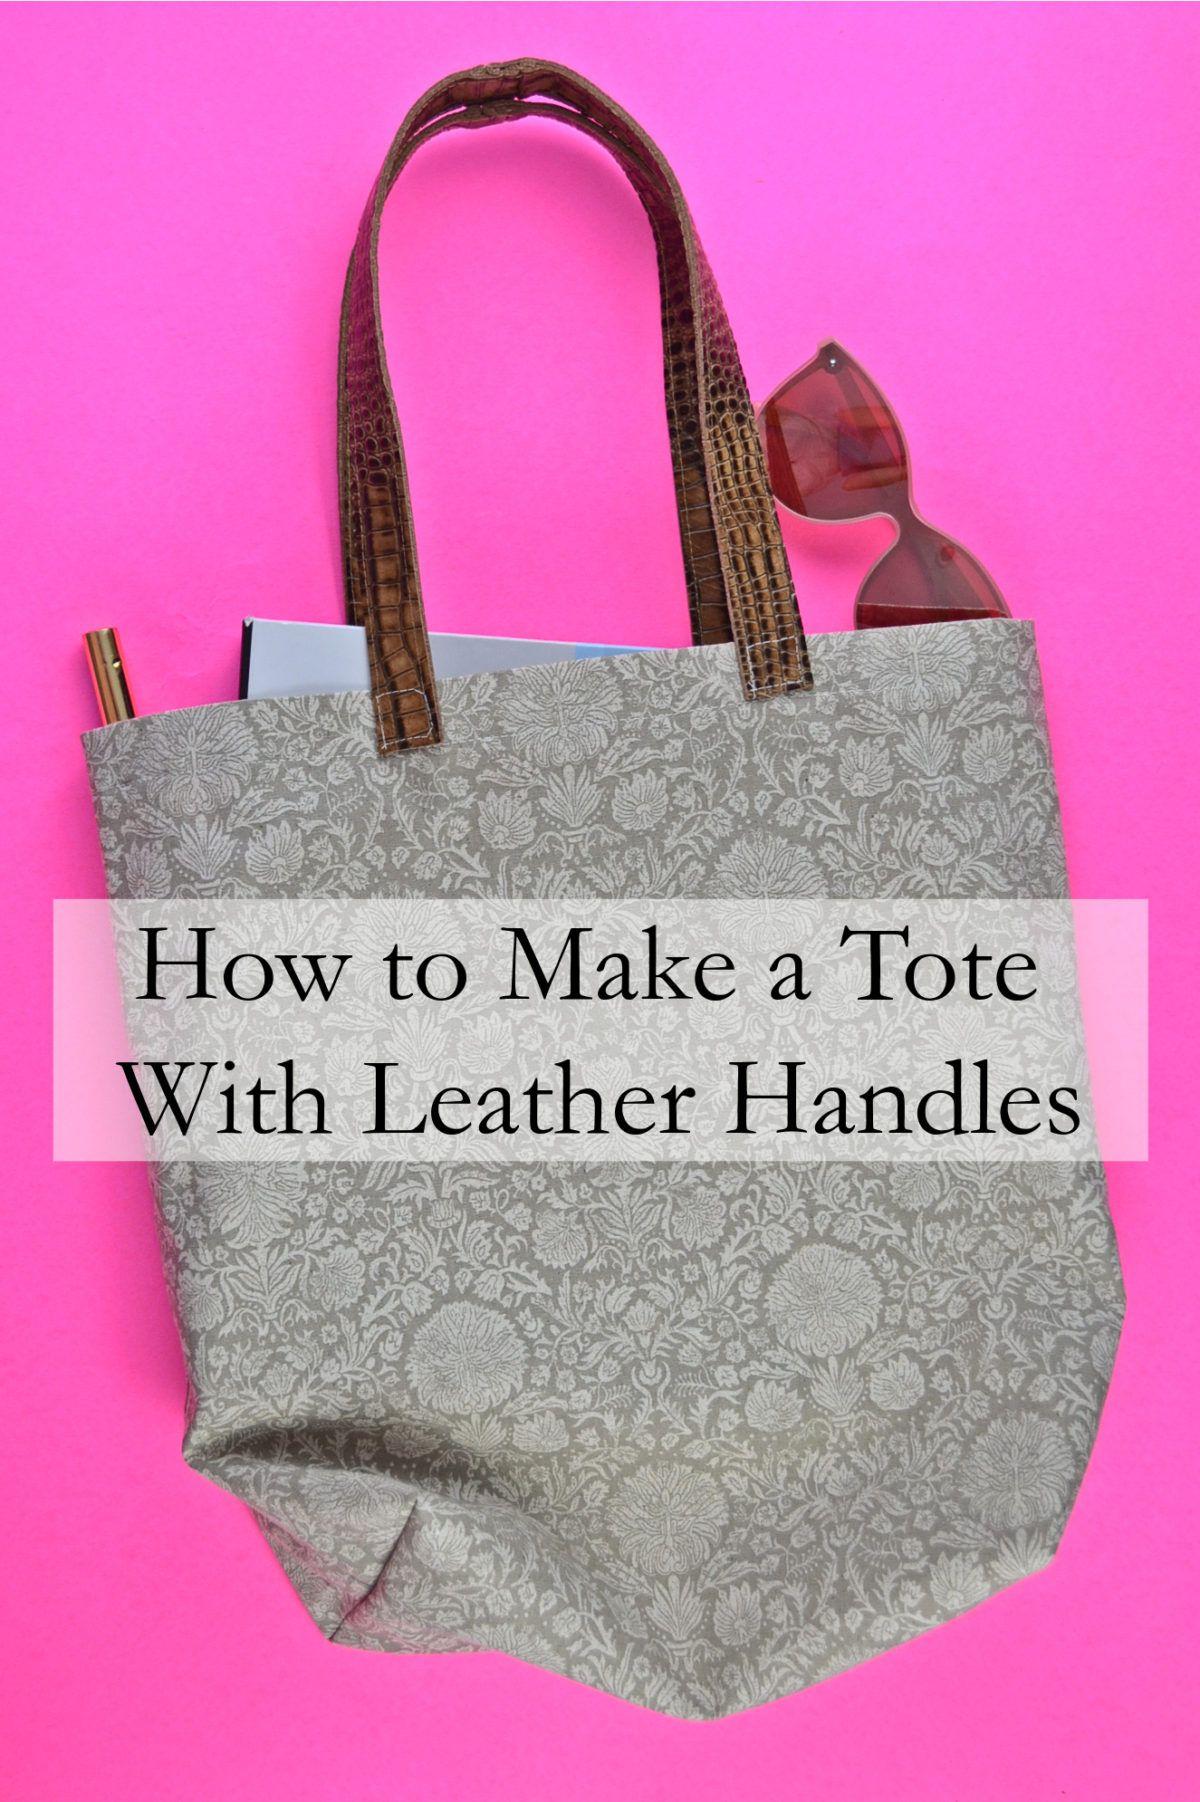 fdae061703 How to Make a Tote Bag with Leather Handles    heatherhandmade.com